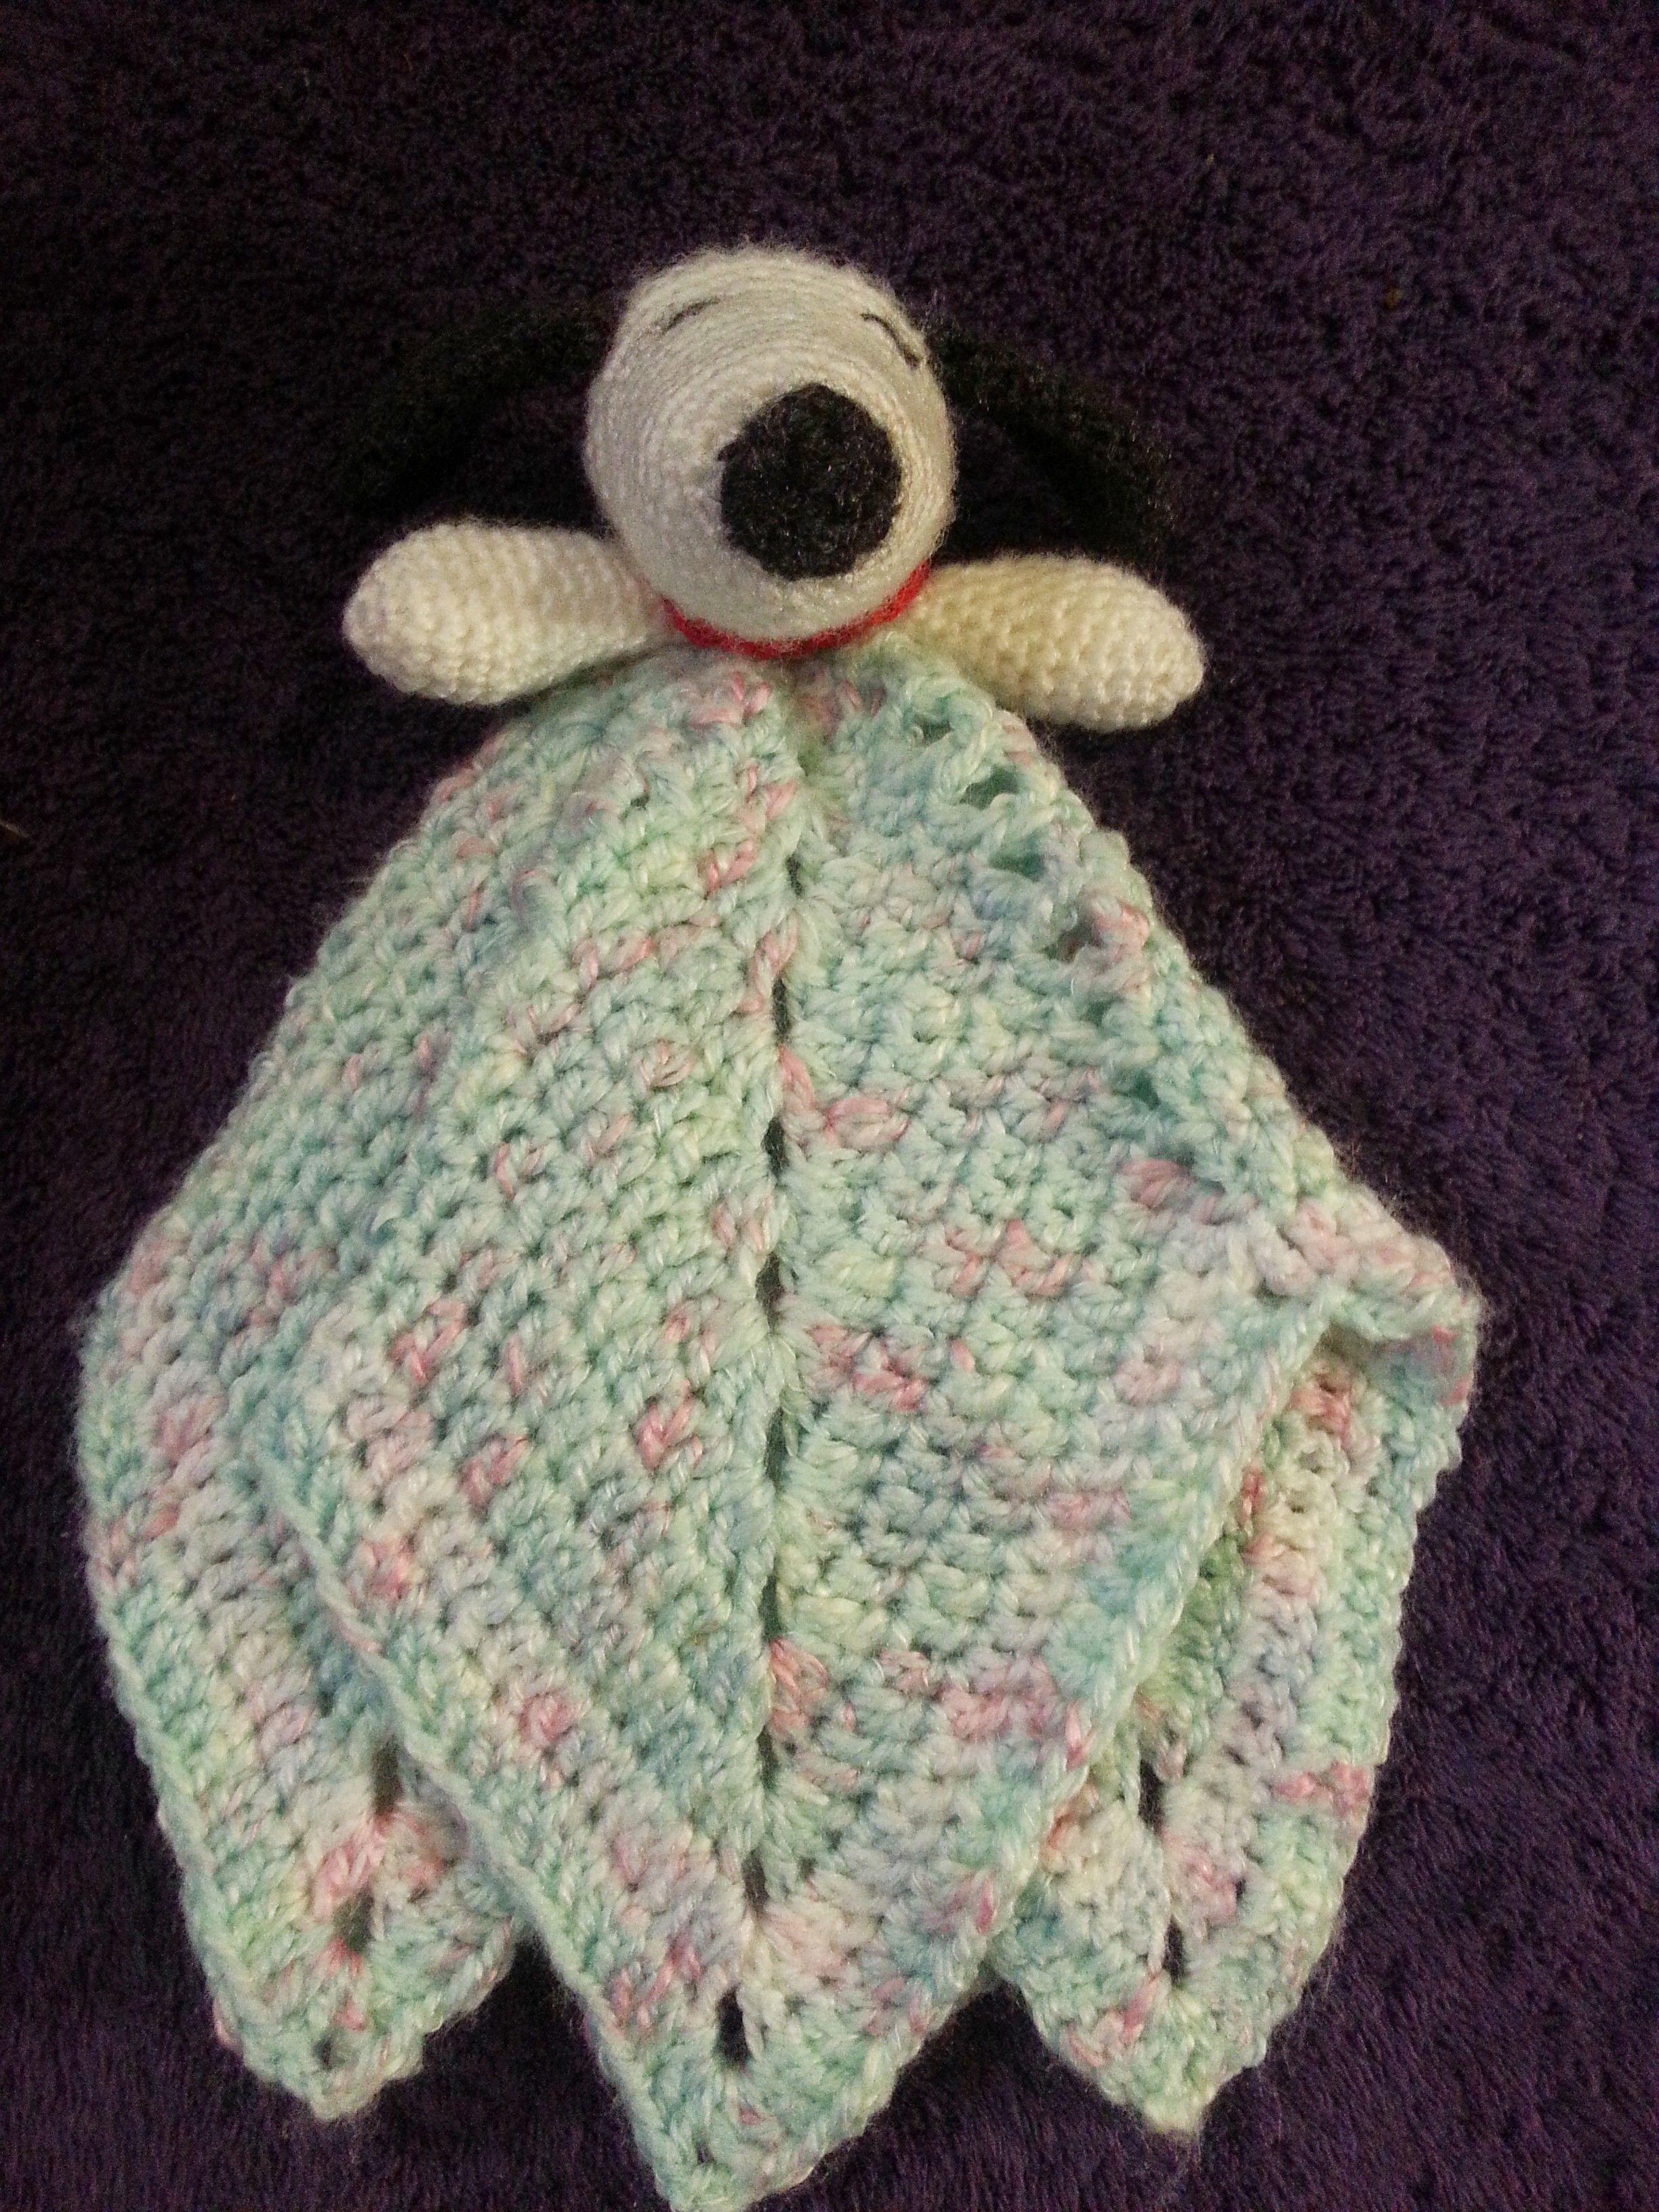 Amigurumi Snoopy Lovey Baby Blanket Star Shaped Baby Stuff